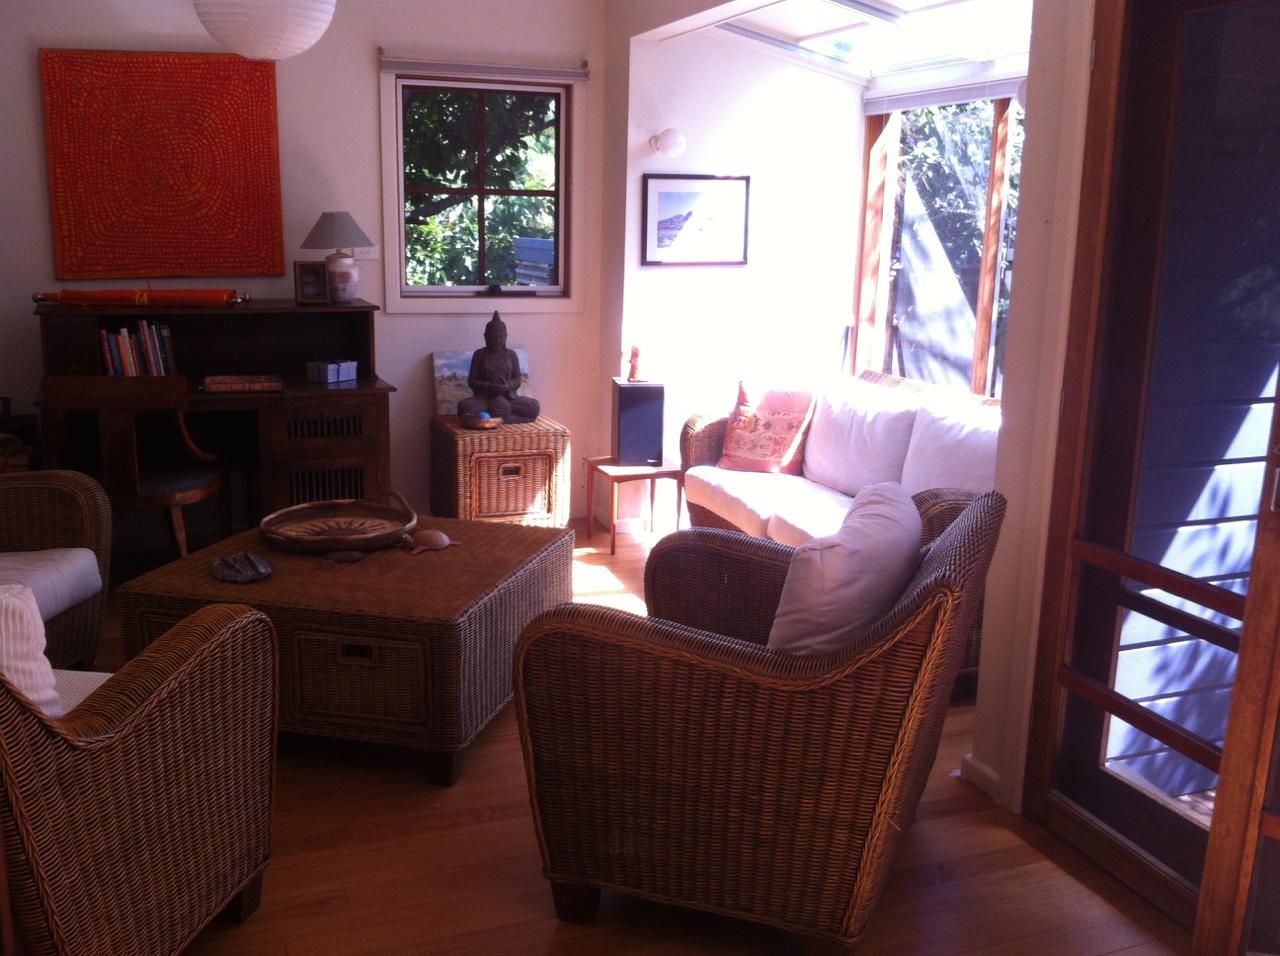 212 living room bef.jpg